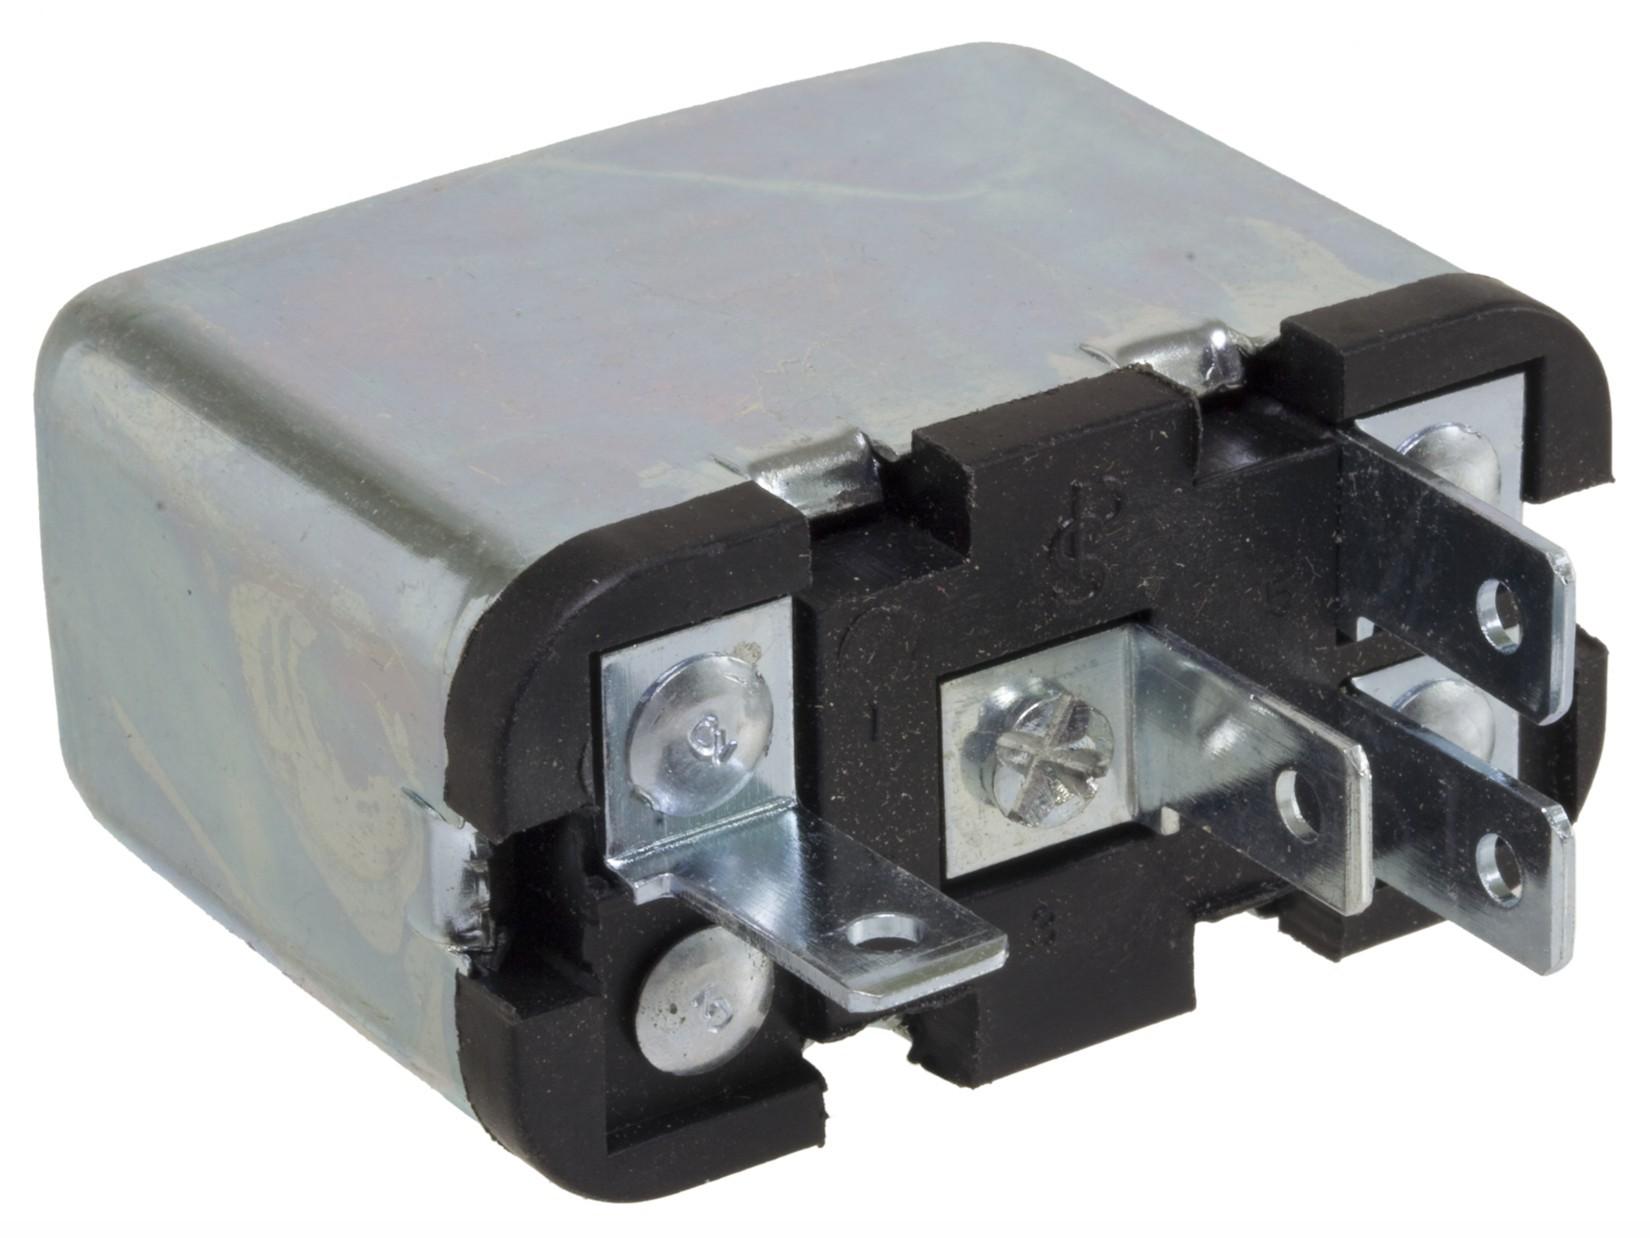 WELLS - HVAC Blower Motor Relay - WEL 19824